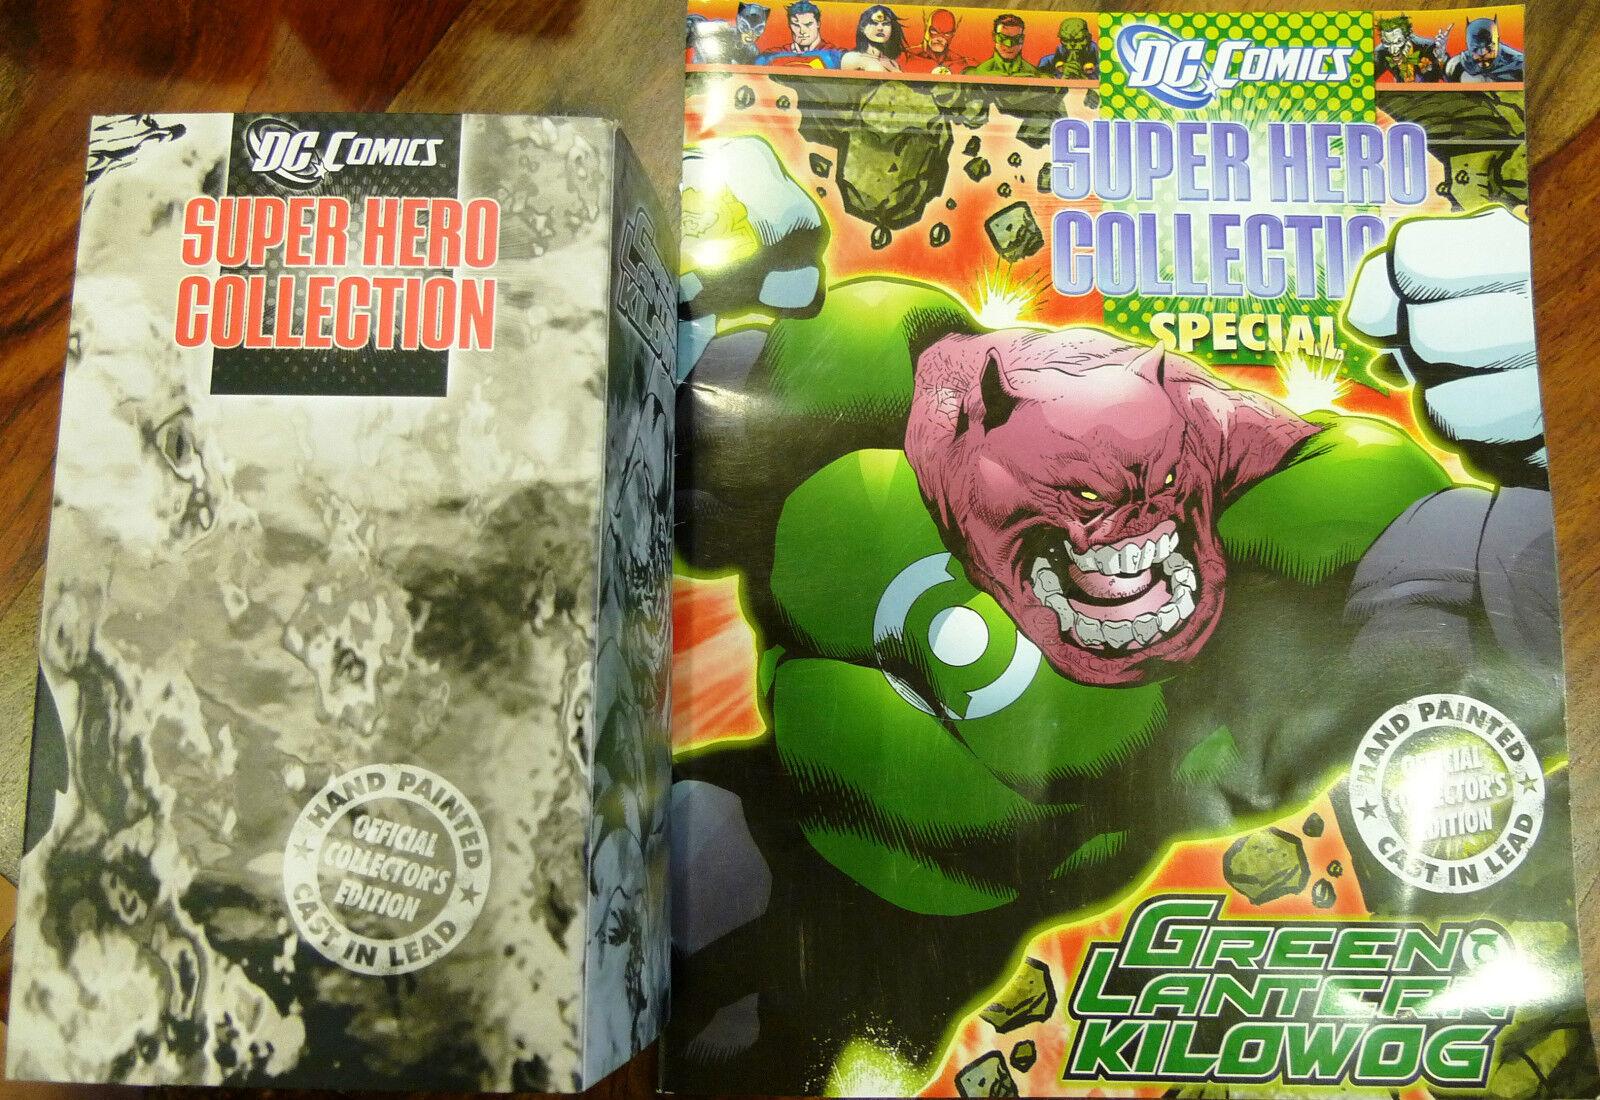 Dc comics superhelden - sammlung thema spezial  Grün lantern kilowog - eaglemoss